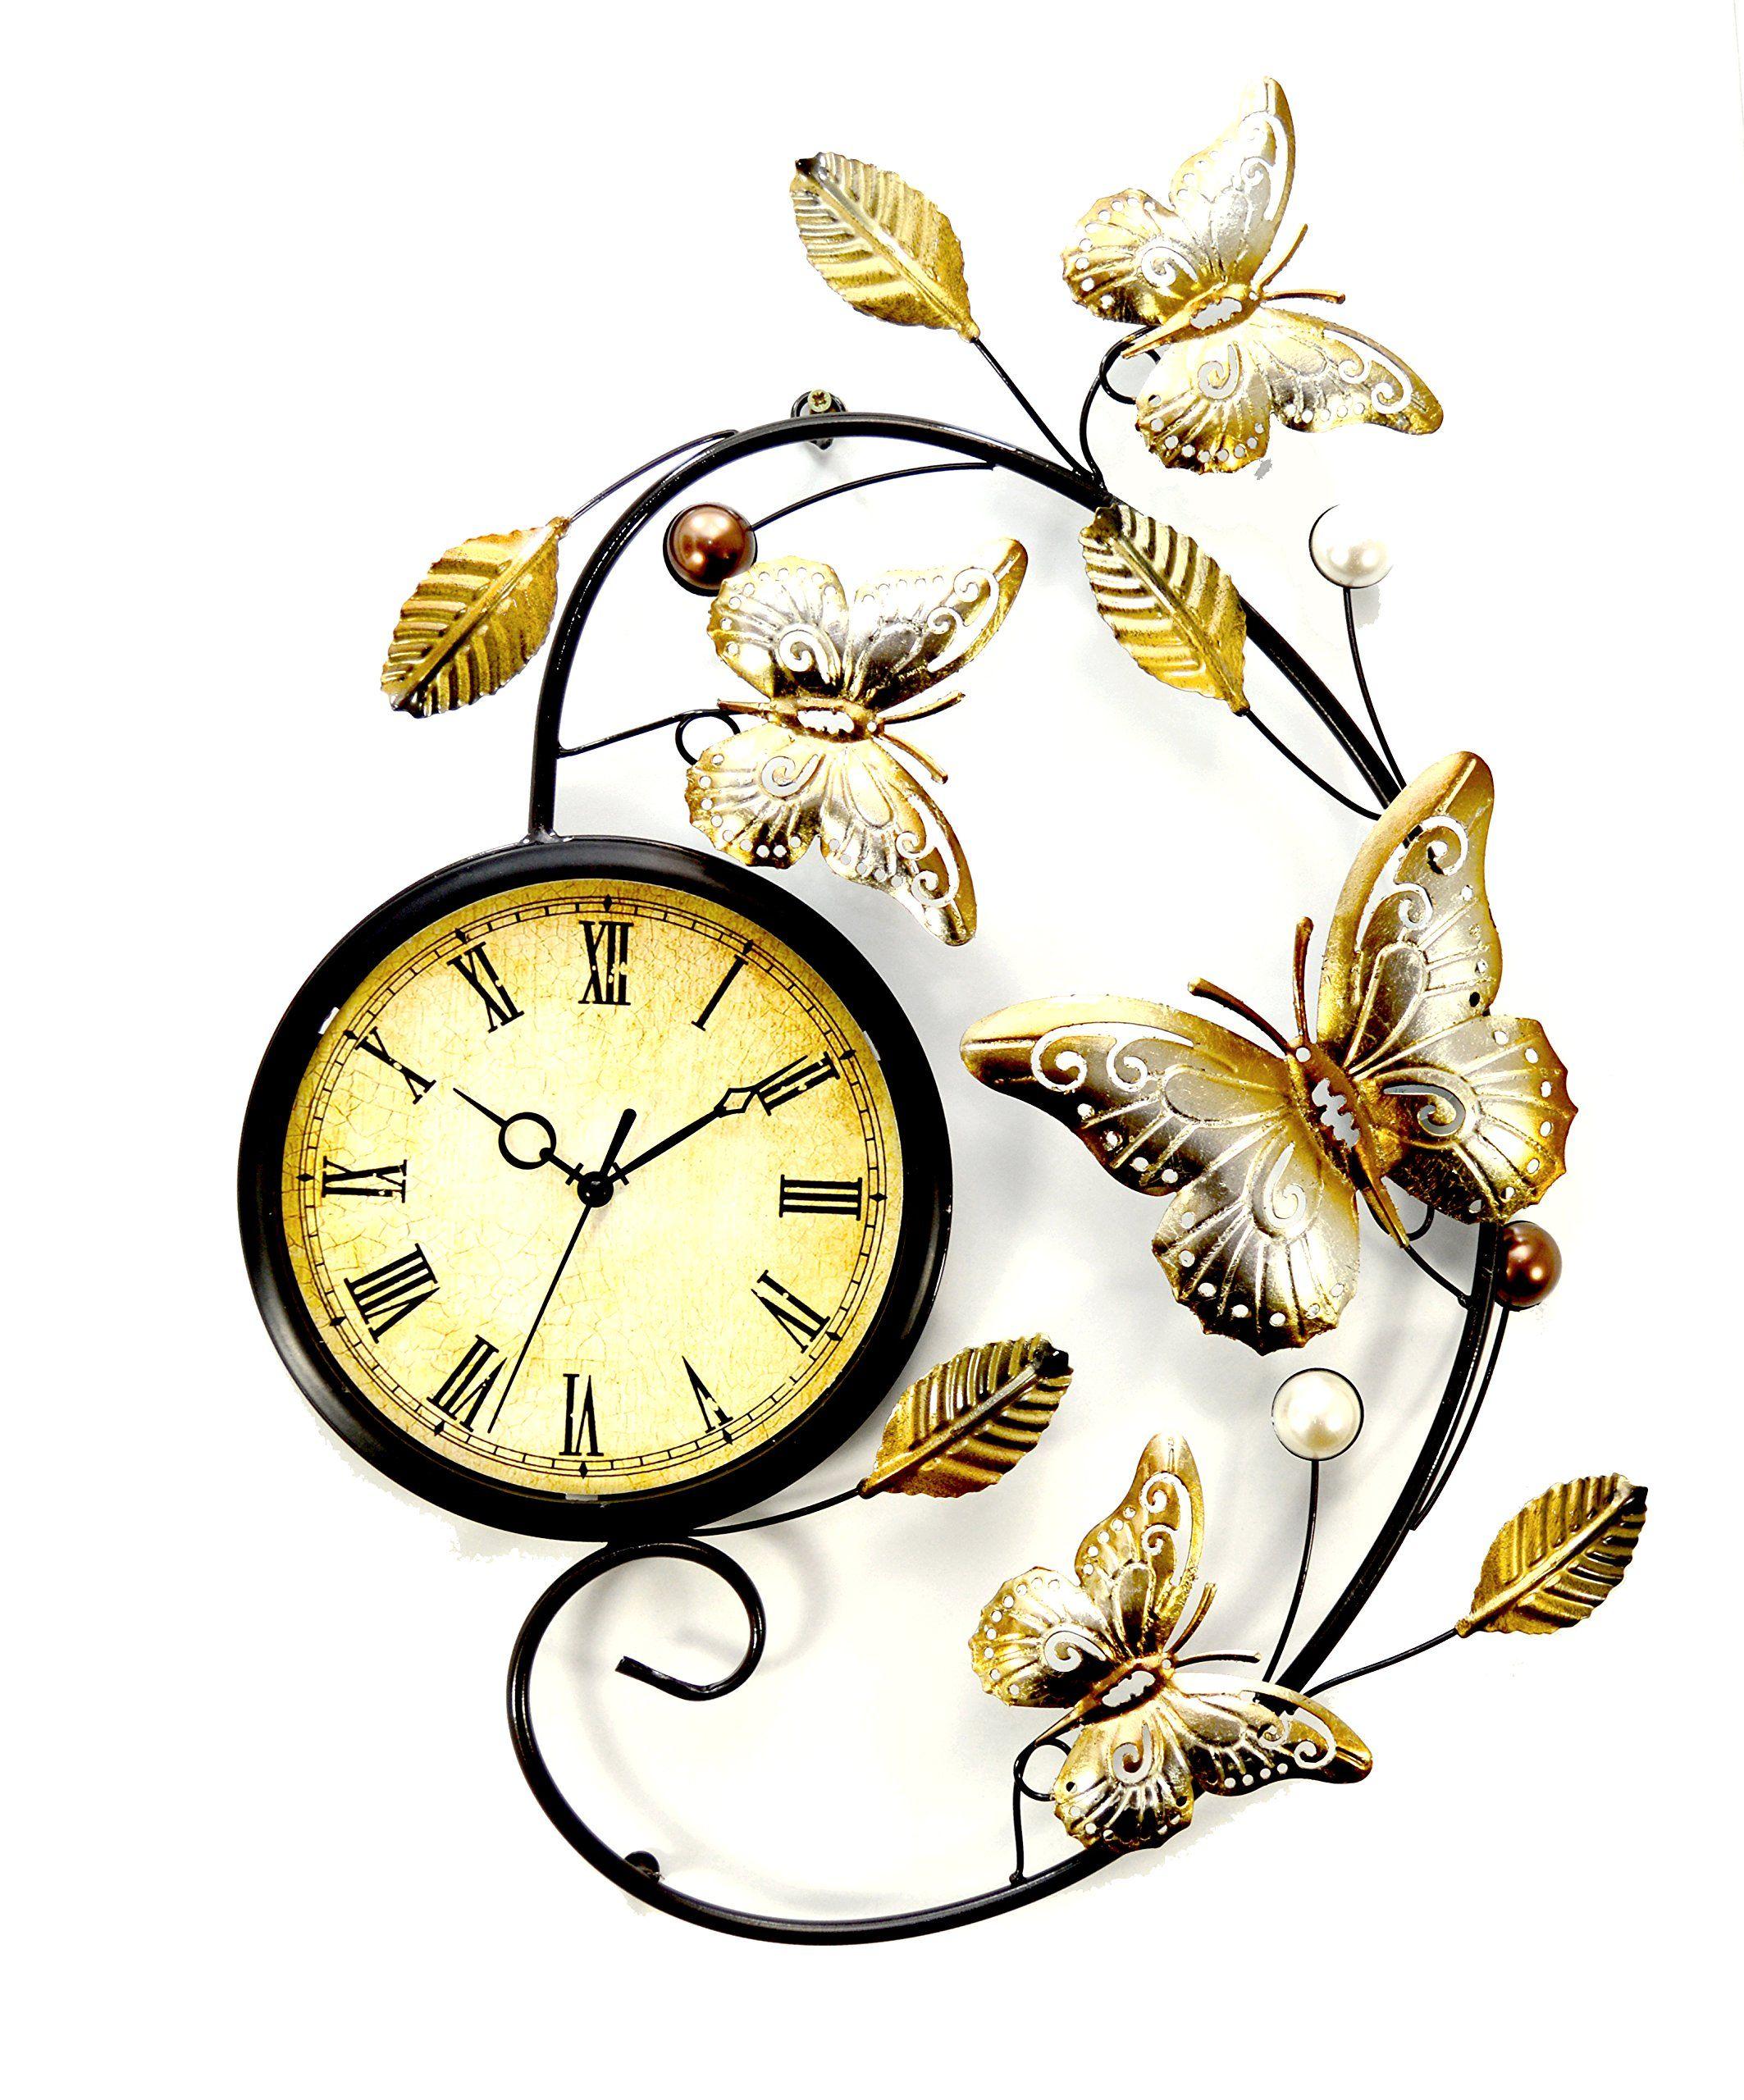 Juliana Home Living Butterfly Metal Wall Art Clock: Amazon ...